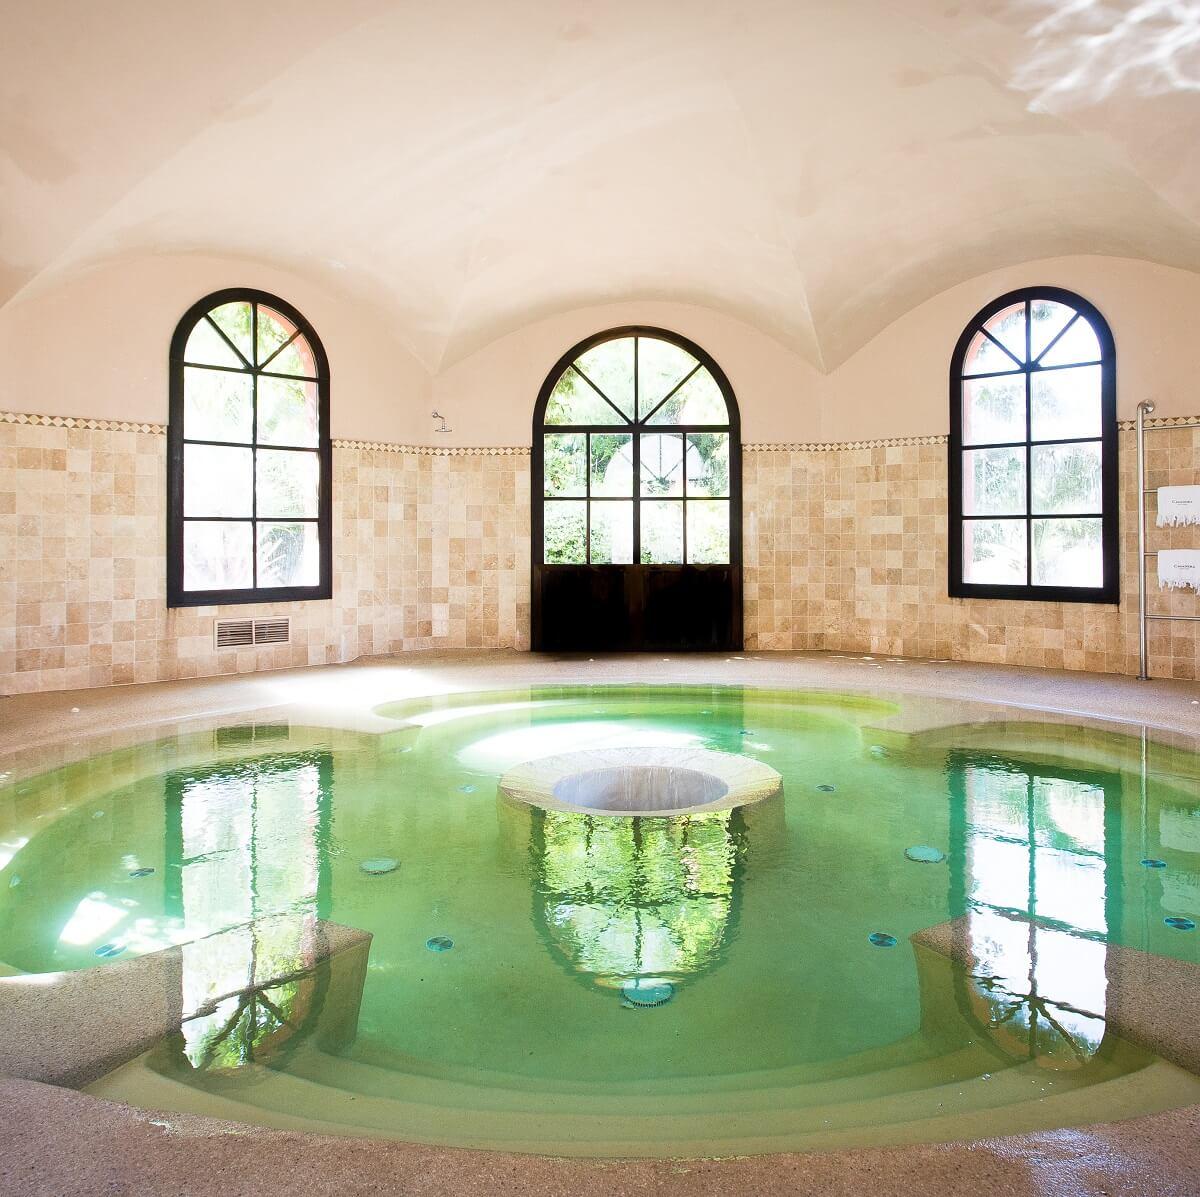 Le Spa - Hôtel La Signoria - Calvi - Corse du sud